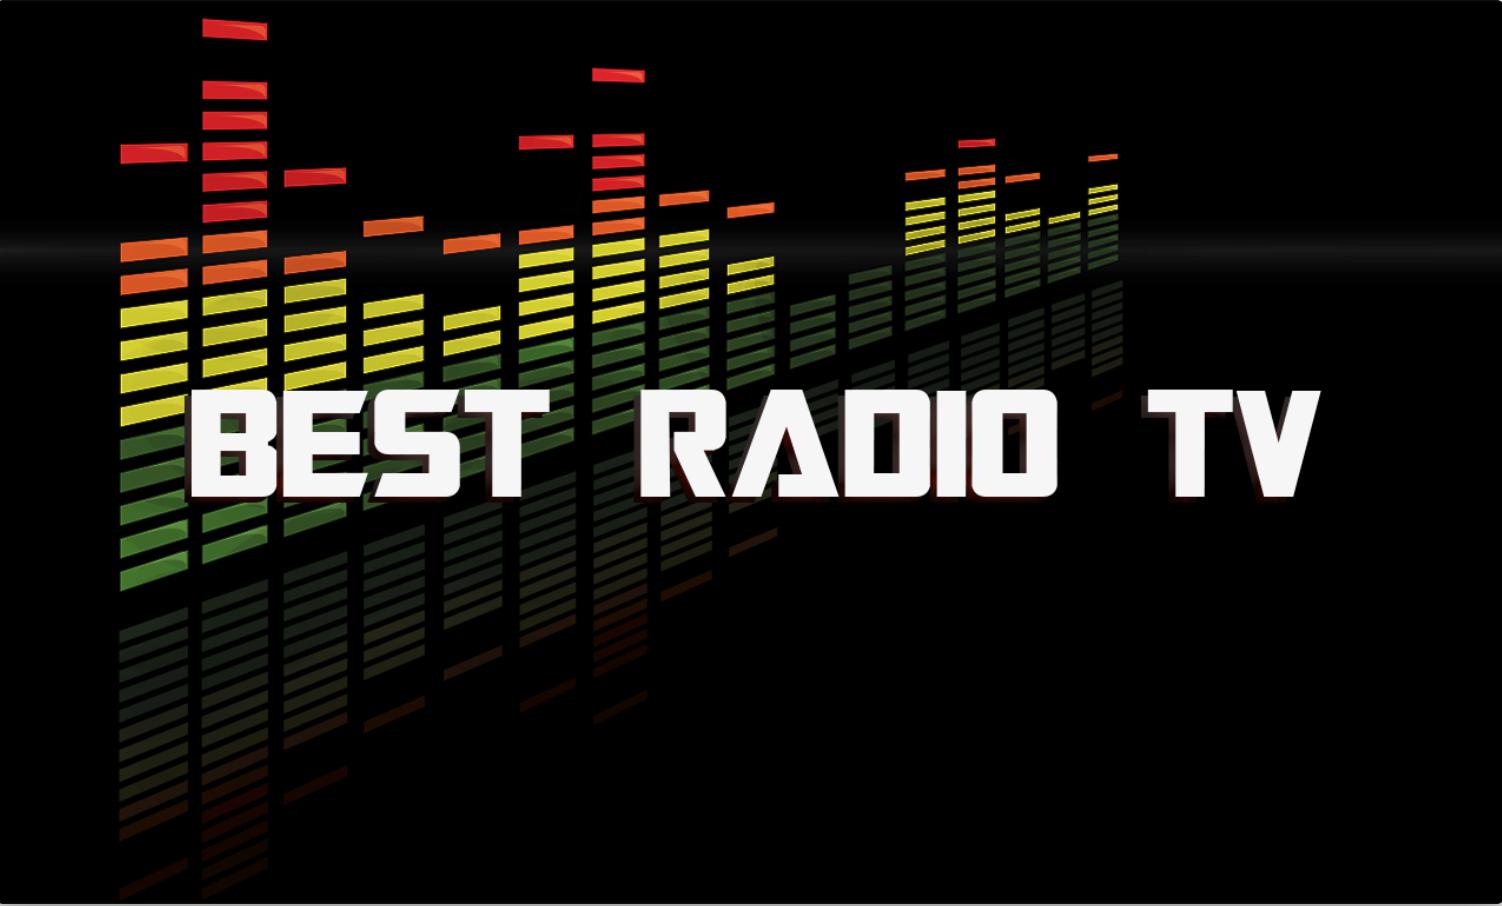 [Dev Story] the history of the development of Best Radio TV (tvOS)